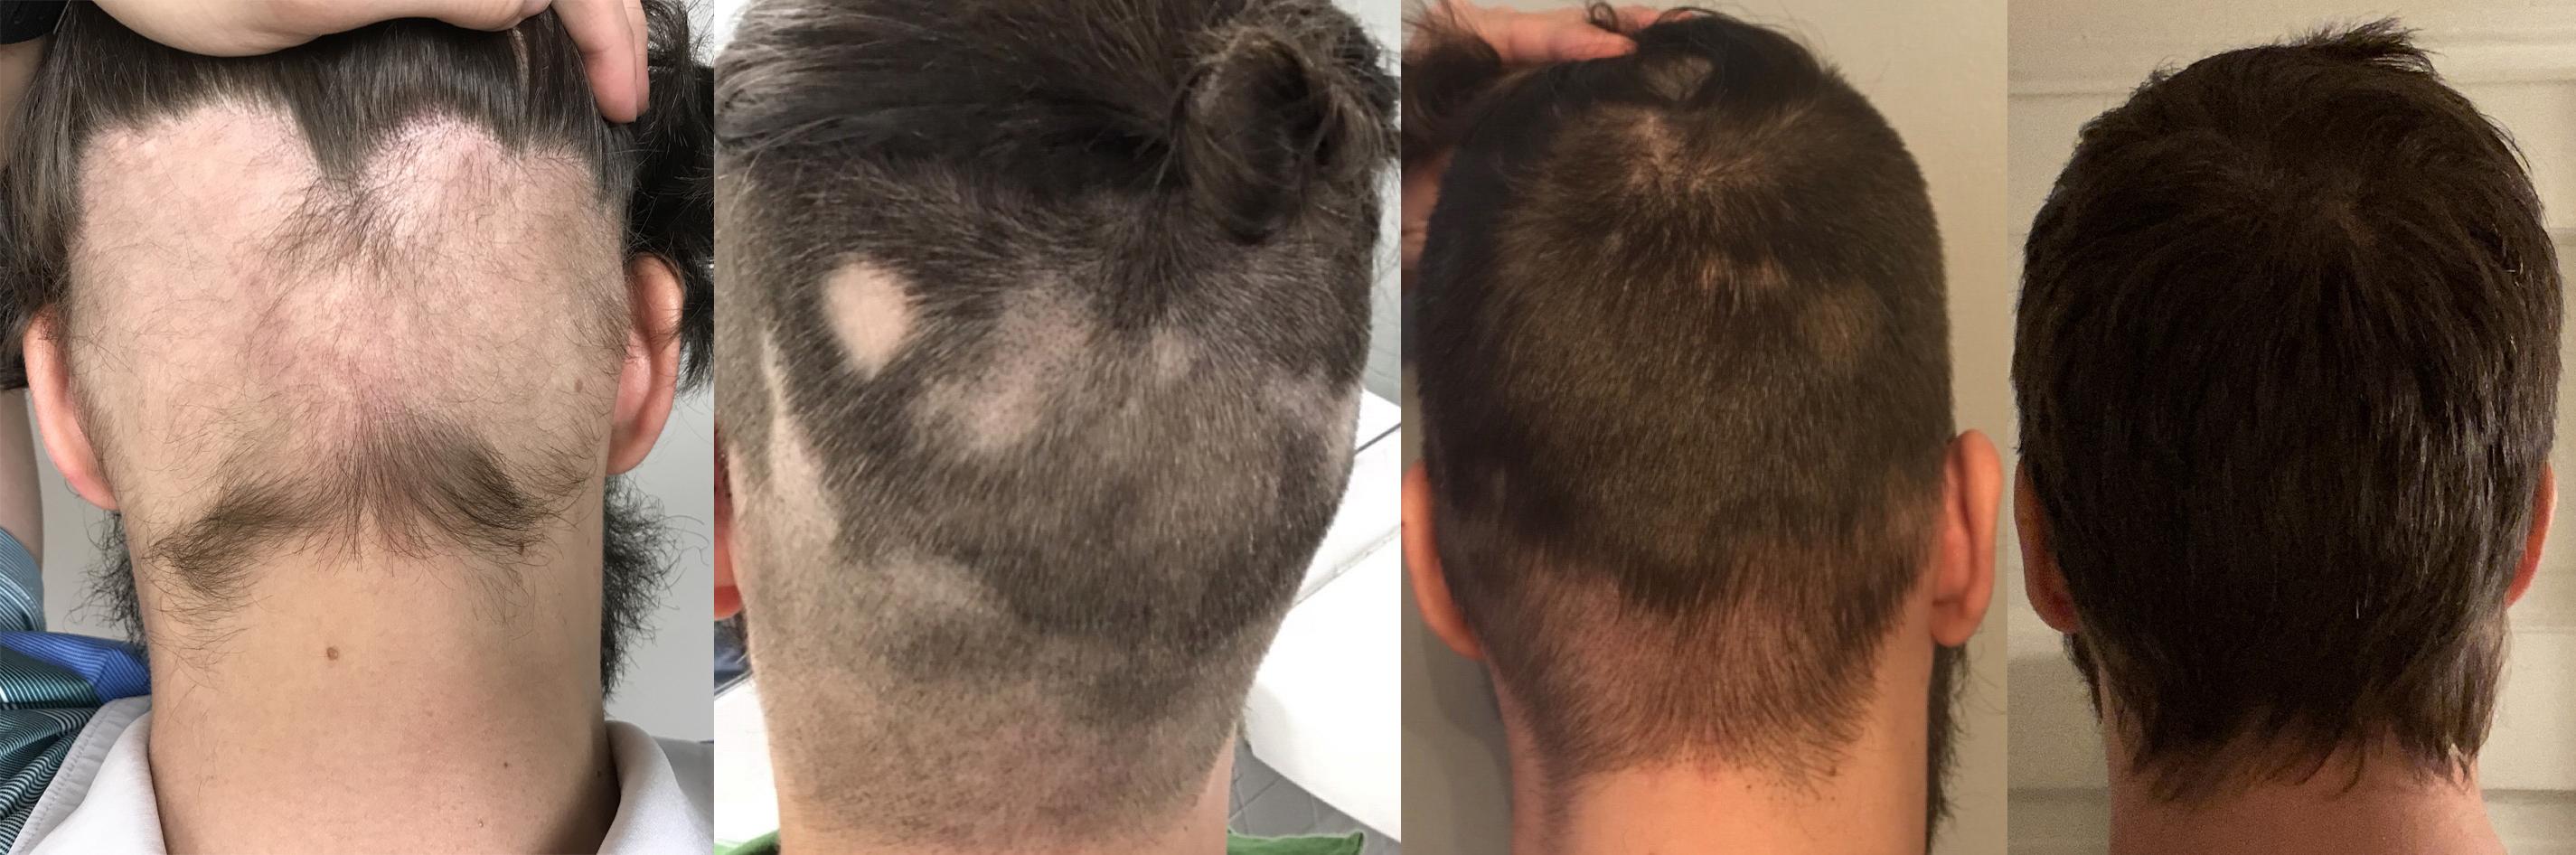 Alopecia Regrowth - David Fedor back